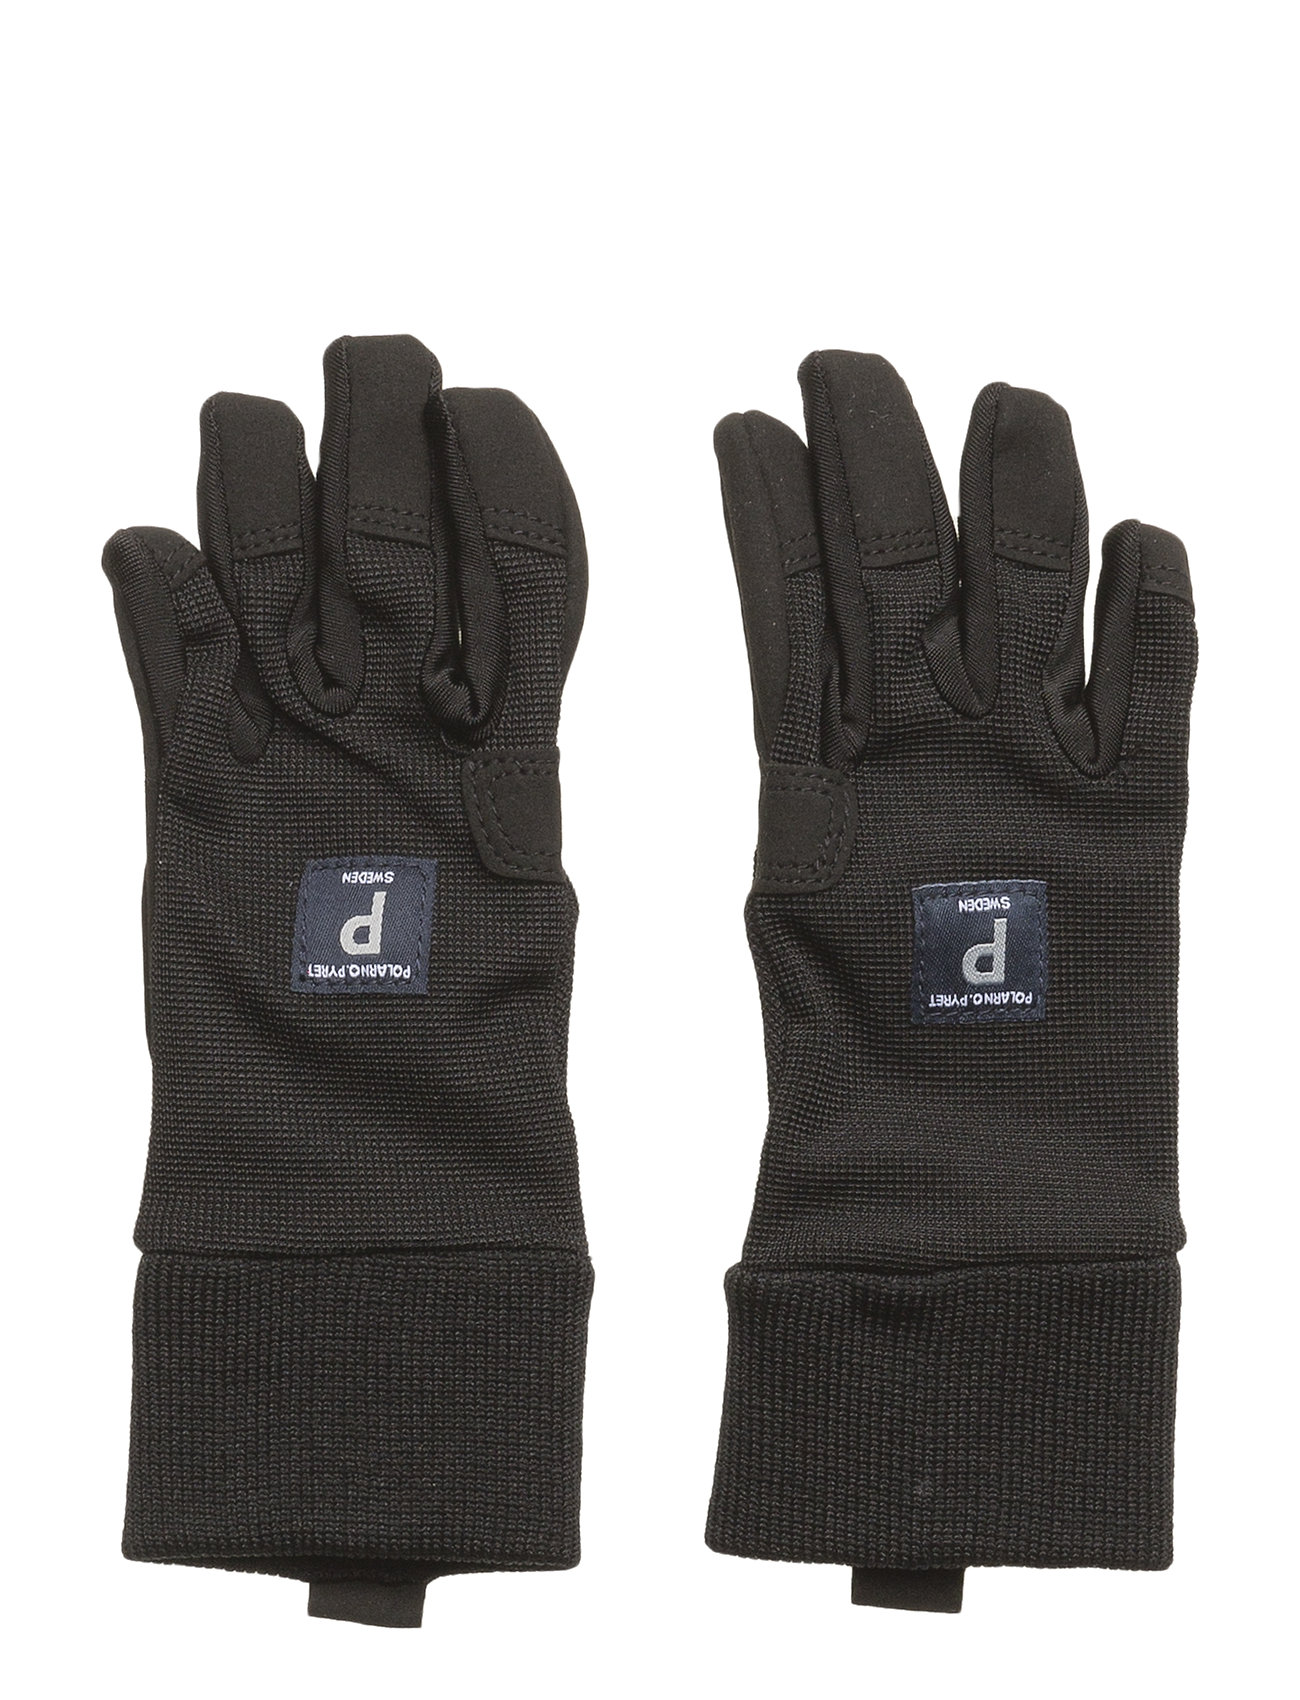 Polarn O. Pyret Glove Solid Preschool - METEORITE